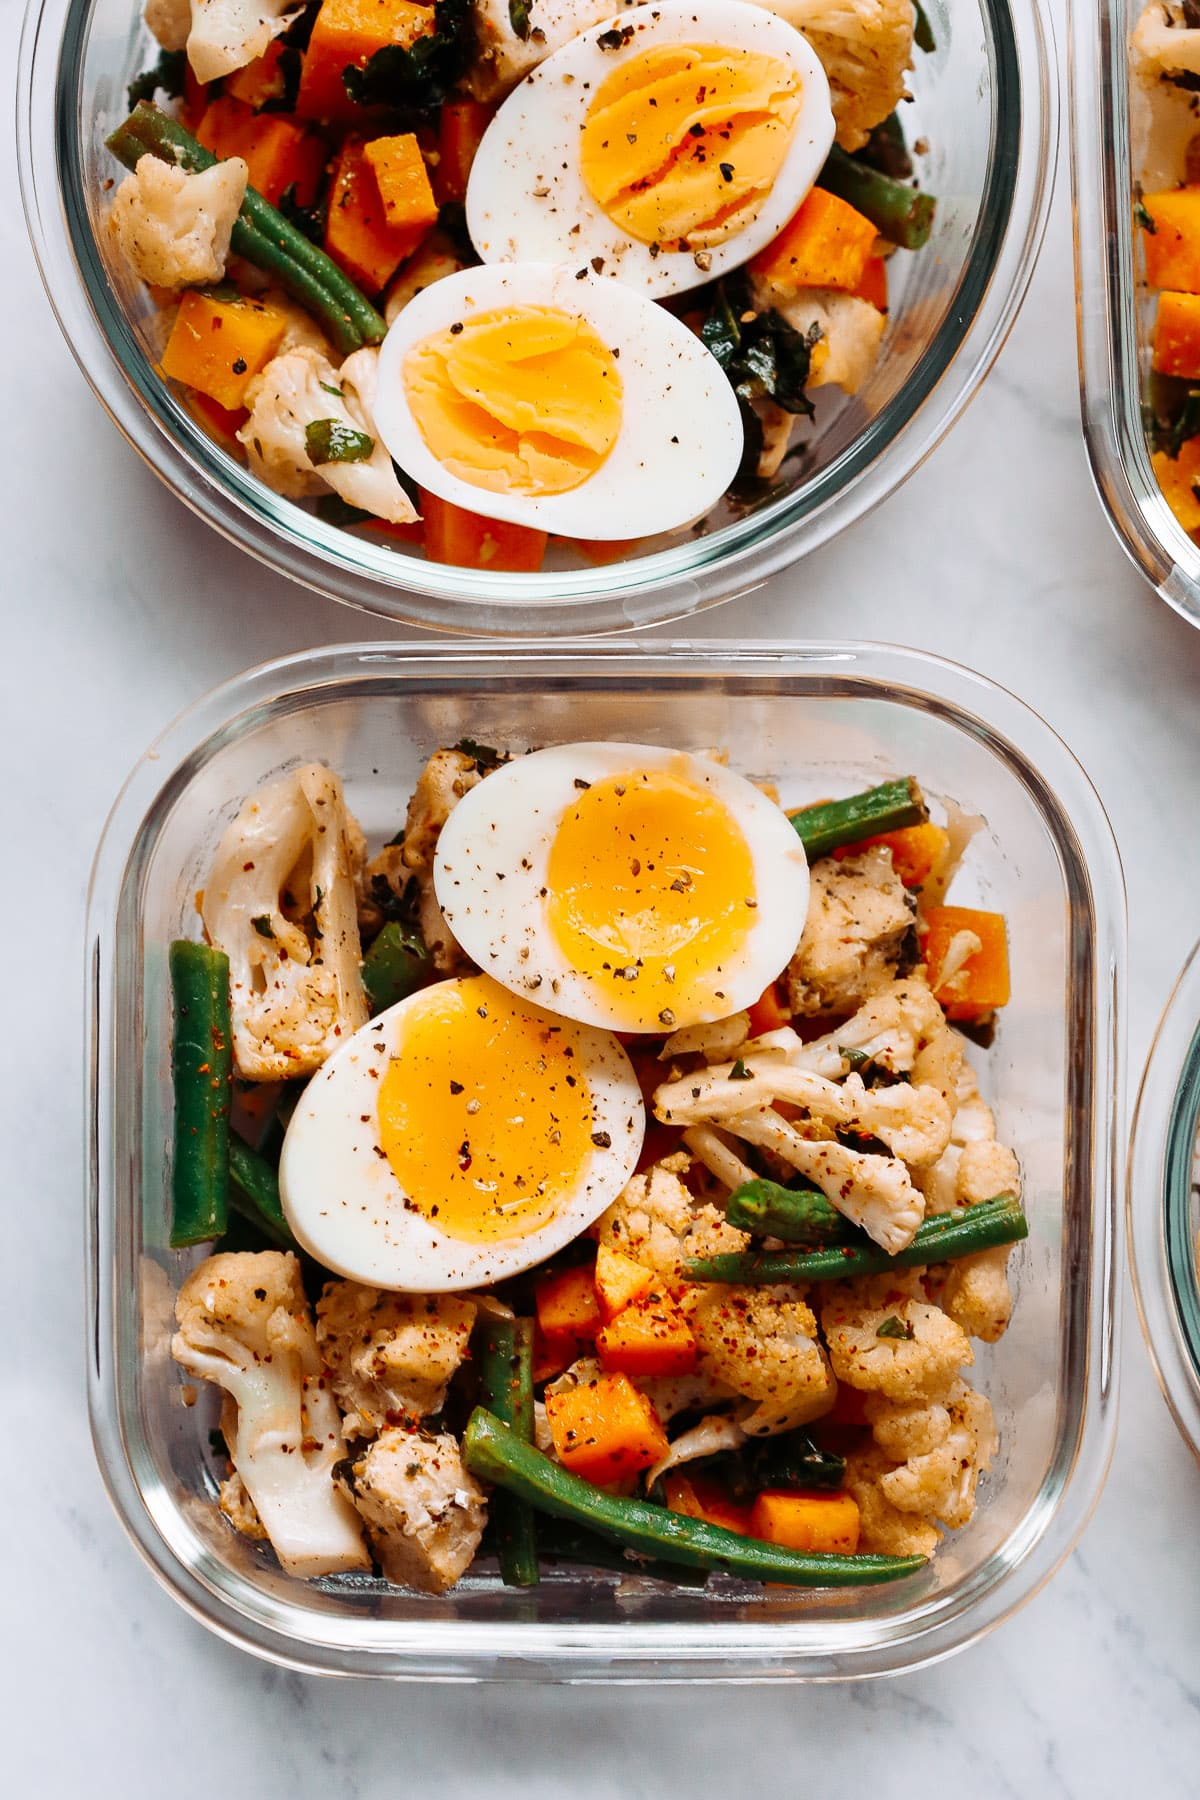 Easy Vegetarian Meal Prep Bowls Paleo Gluten Free Amp Whoel30